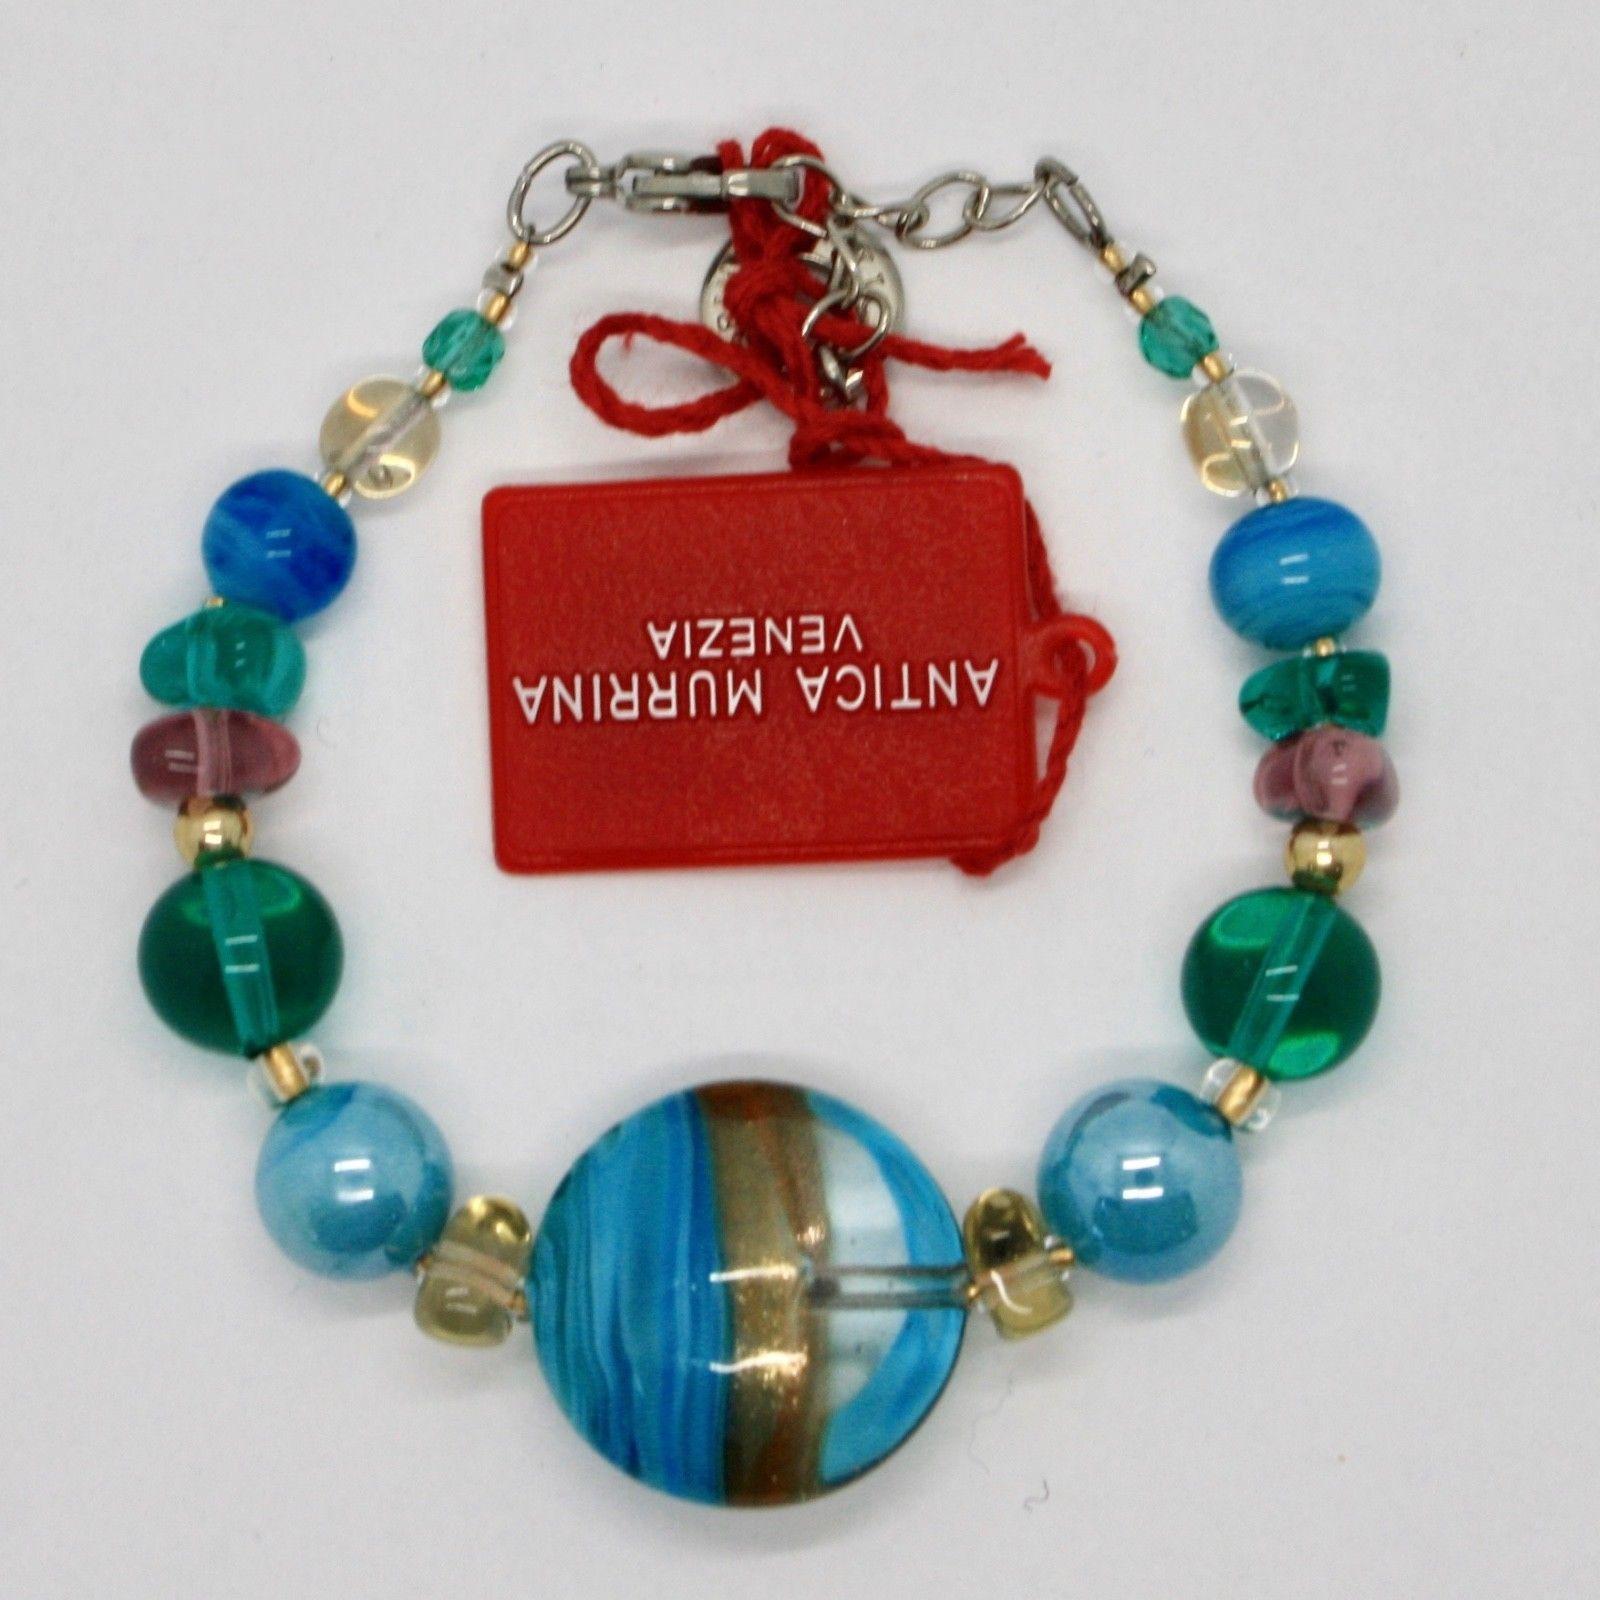 ANTICA MURRINA VENEZIA BRACELET WITH MURANO GLASS BLU GOLD TURQUOISE BR761A07